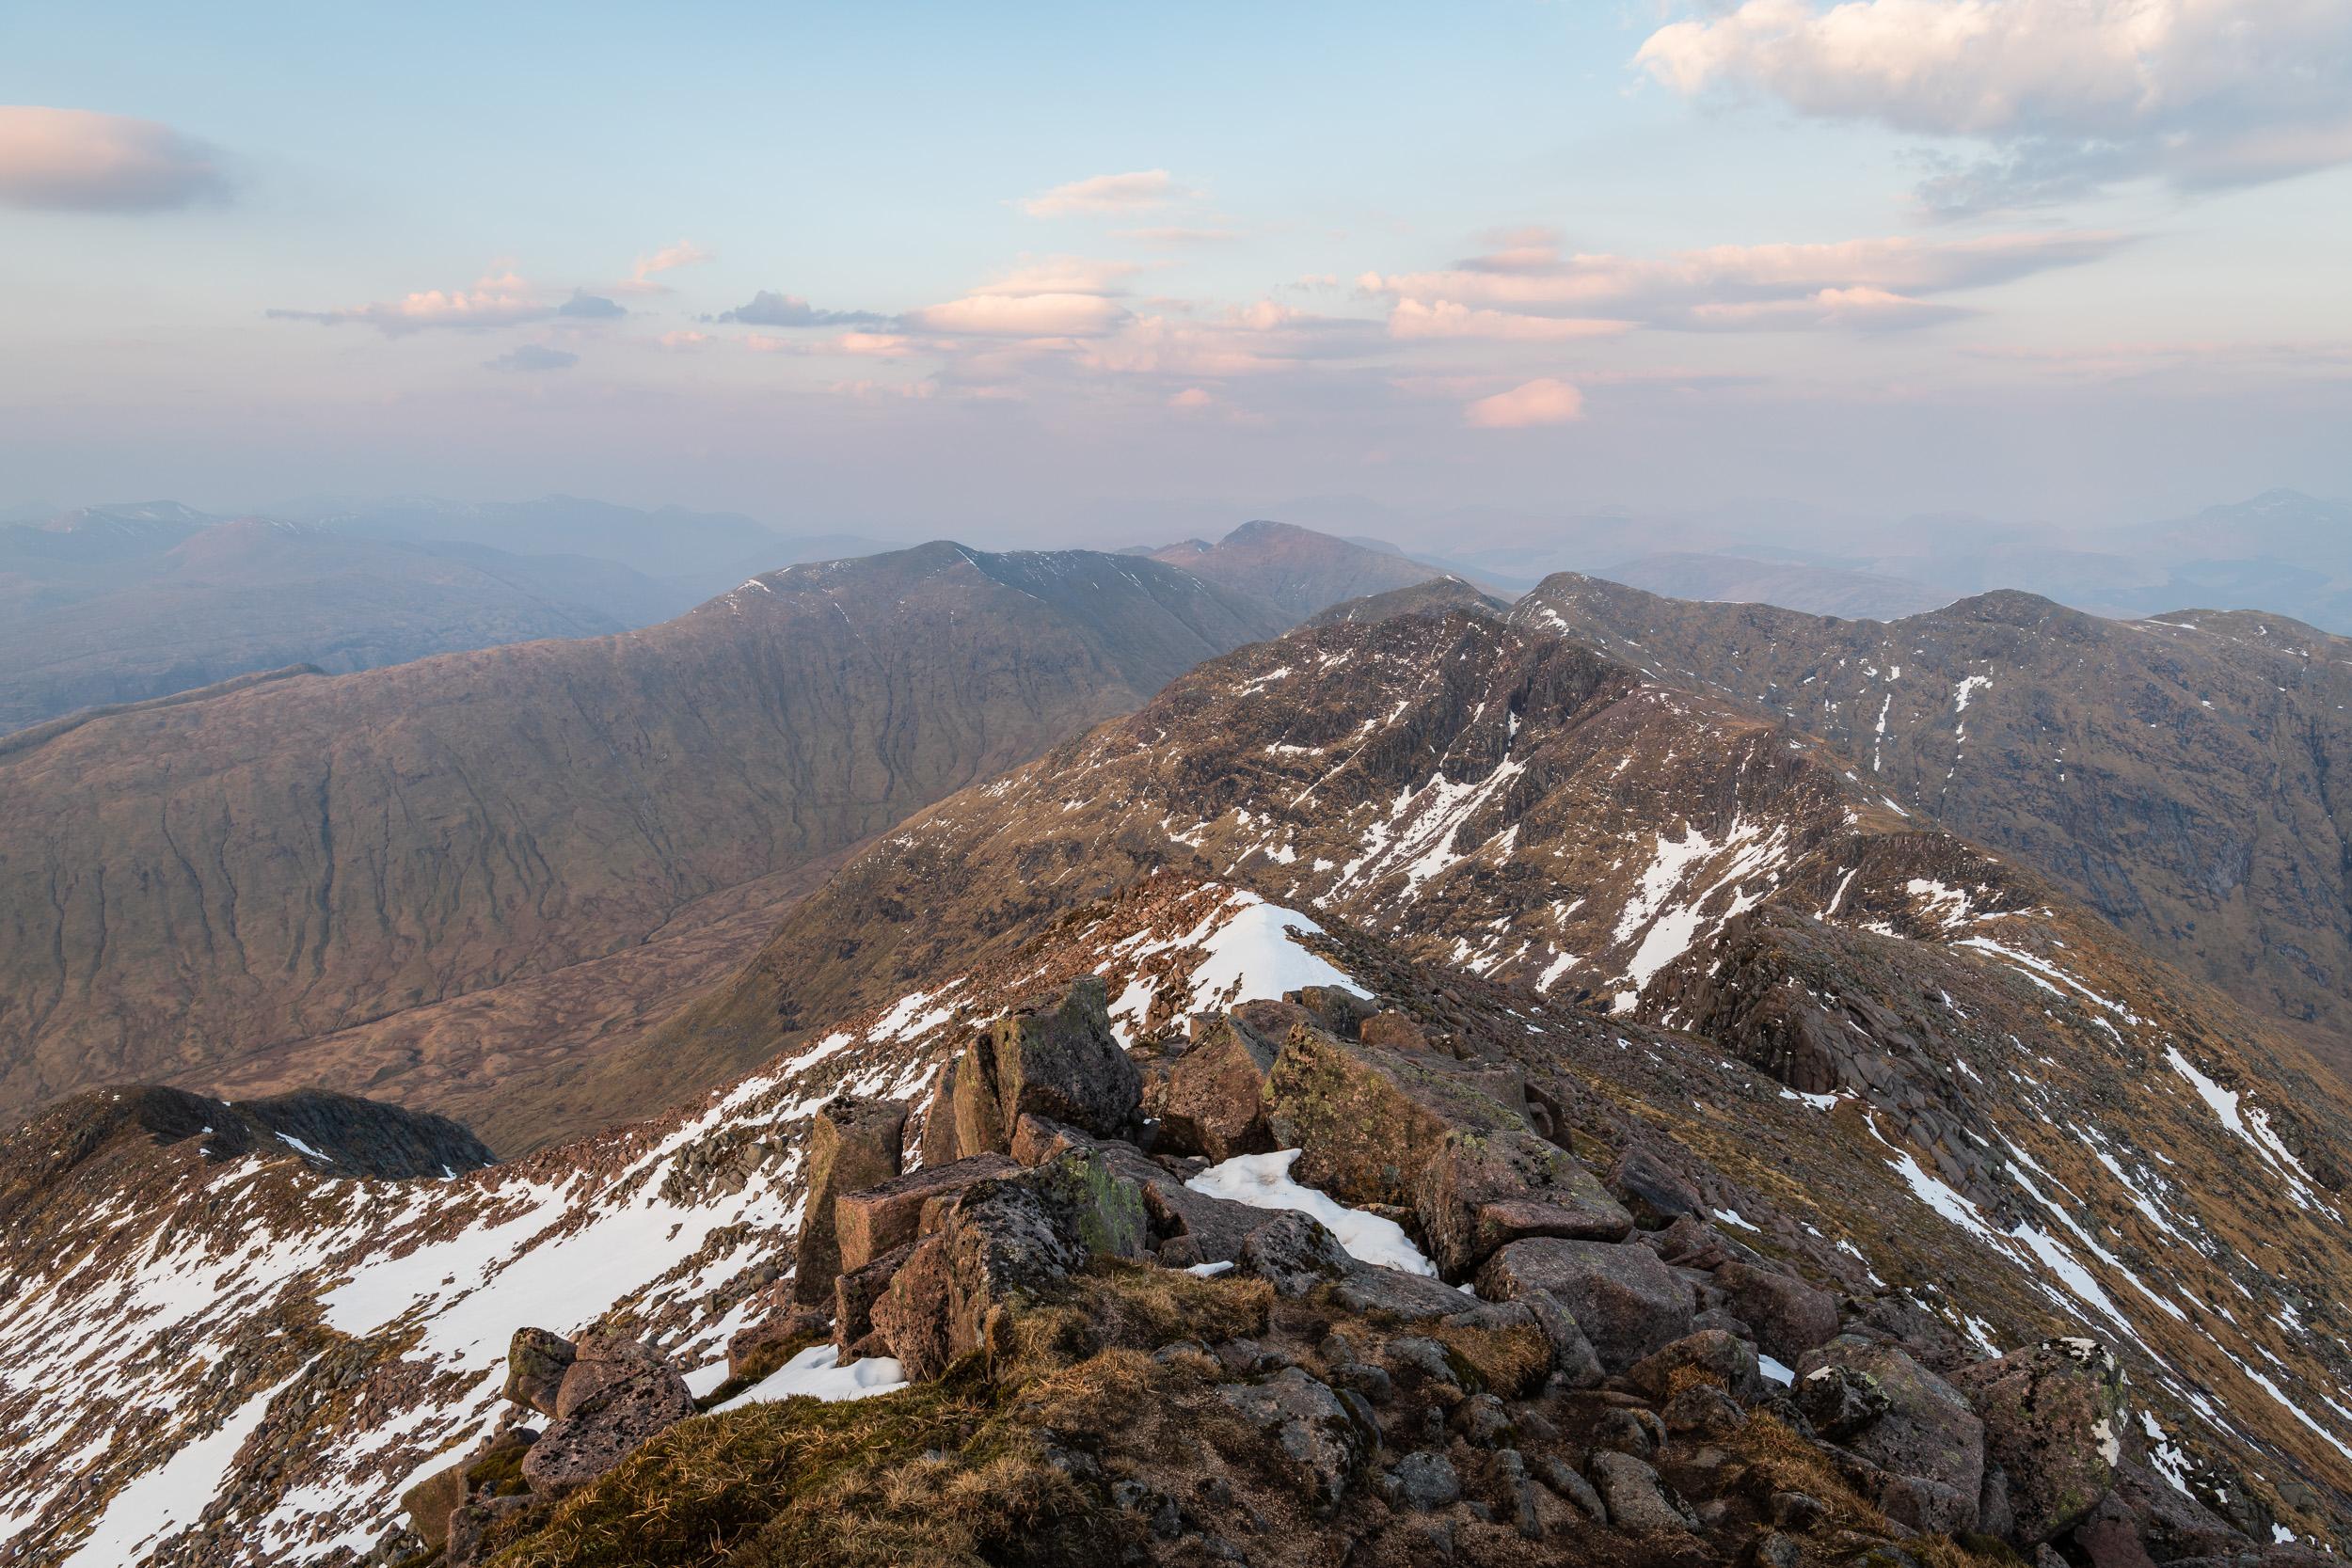 Drochaid Ghlas from Ben Cruachan, Argyll, Scotland  - Nikon D850, Nikkor 24-70 mm f/2.8 VR at 24, f/13, 1/5th sec at ISO 64.